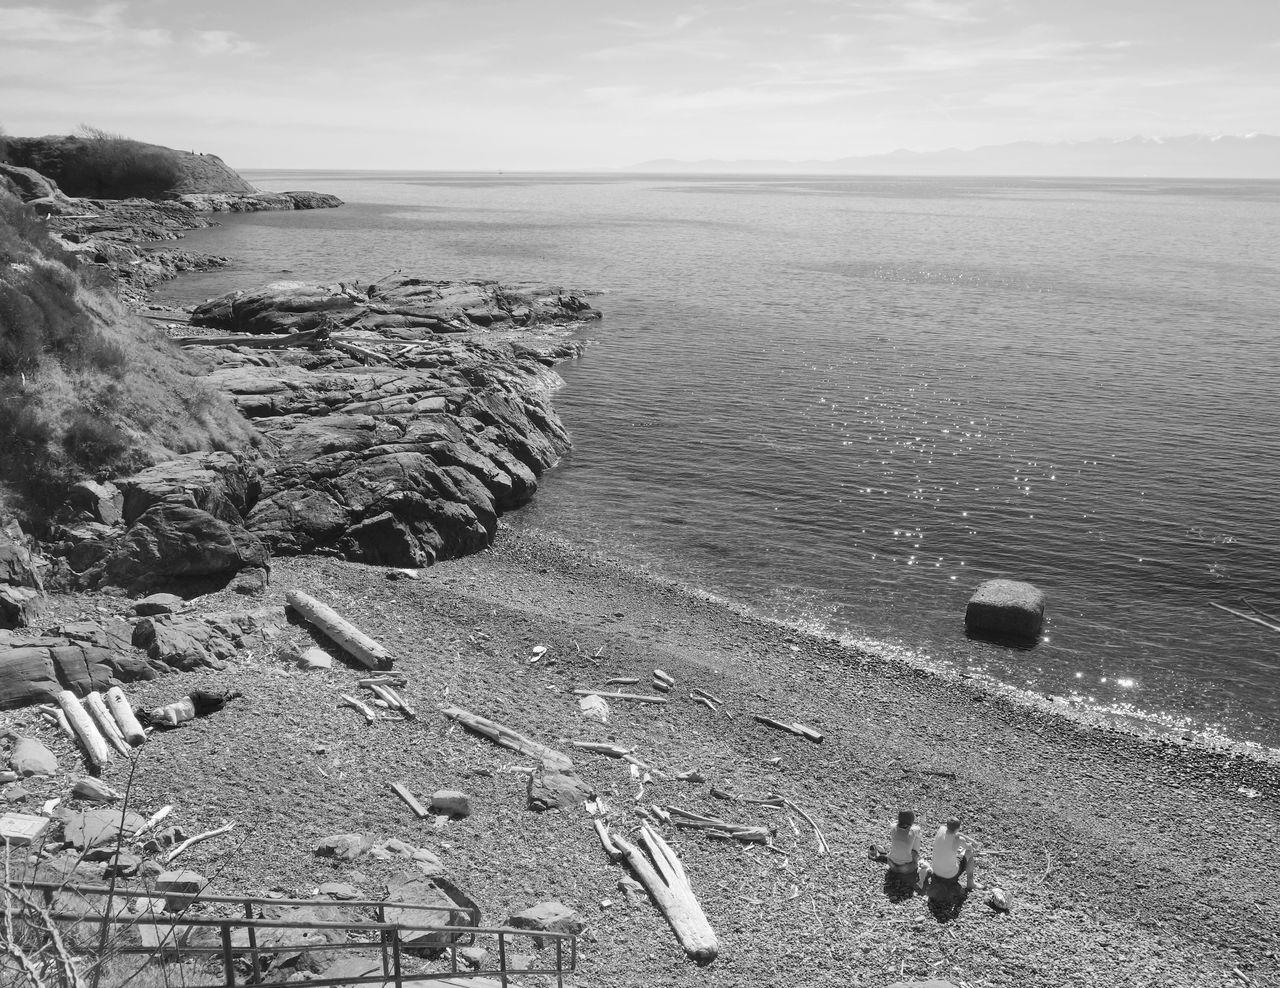 Seascape Beach Seaside Seashore Black & White Blackandwhite Black And White Blackandwhite Photography Bw Sea